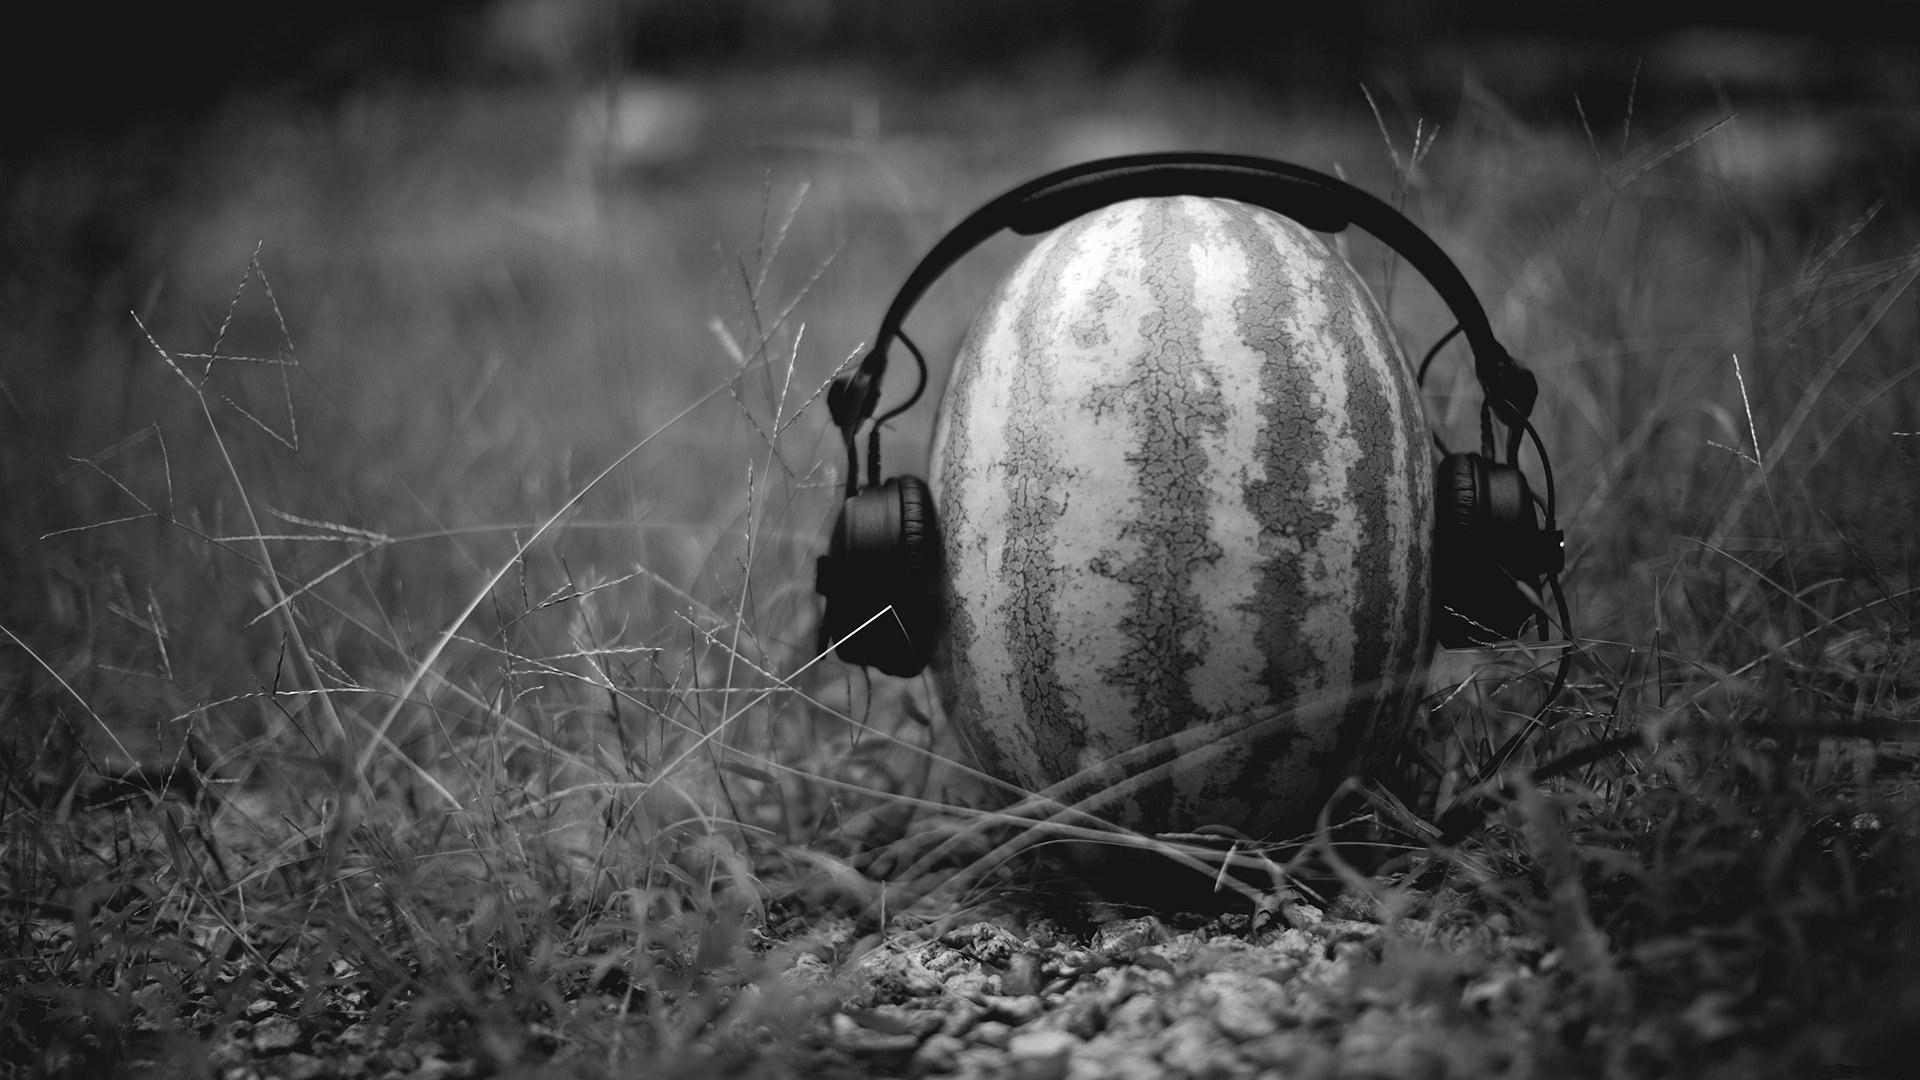 Image Headphones Creative Watermelons